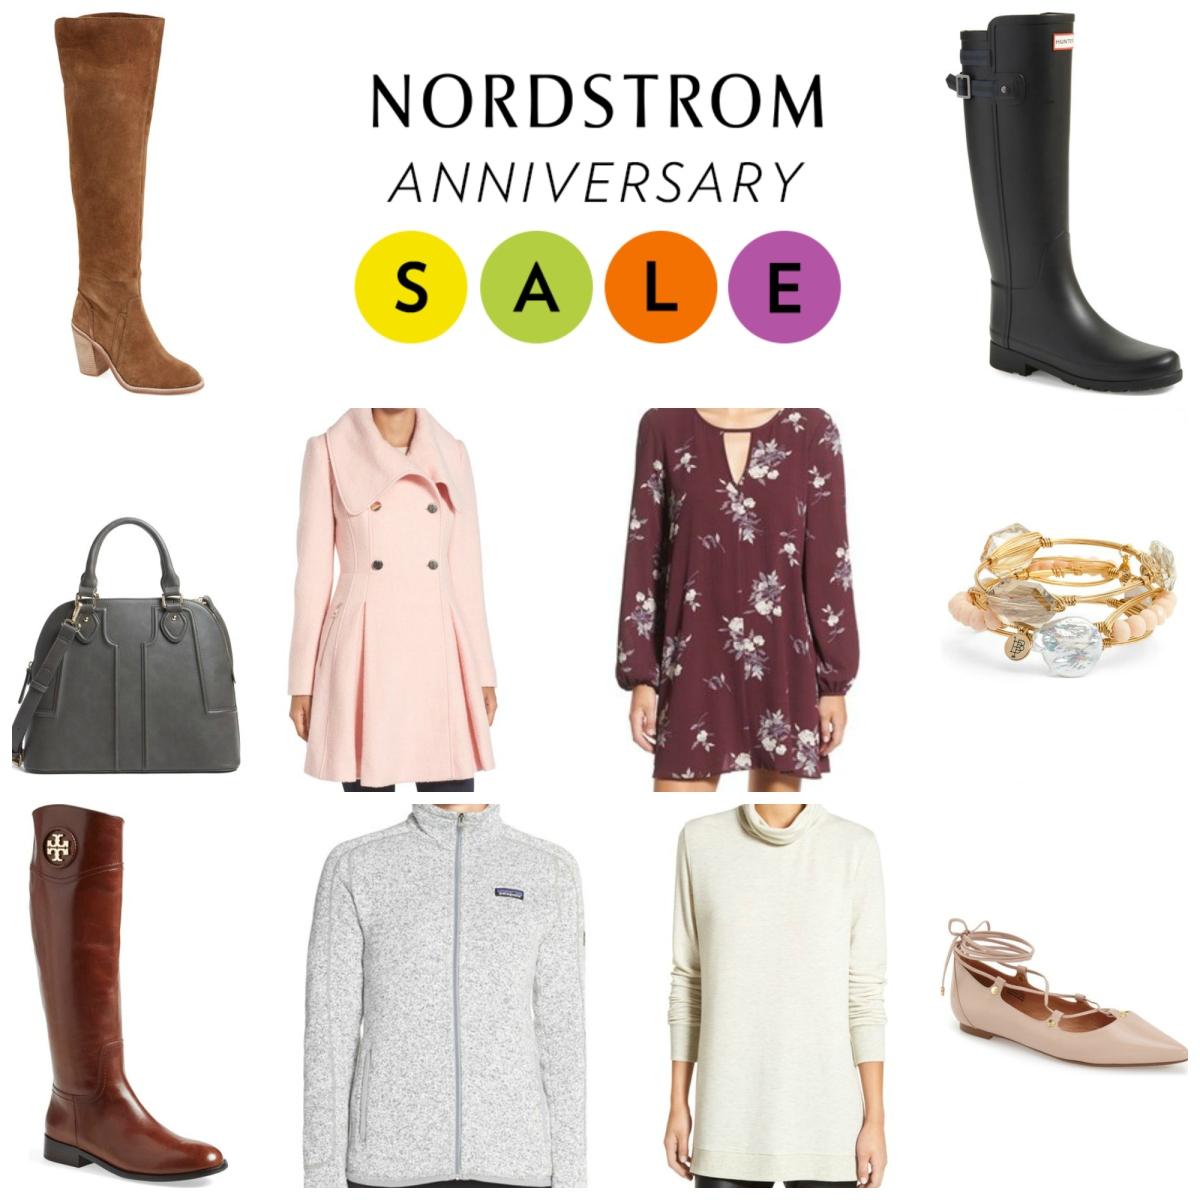 Nordstrom Anniversary Sale 2016 | www.pearlsandsportsbras.com |